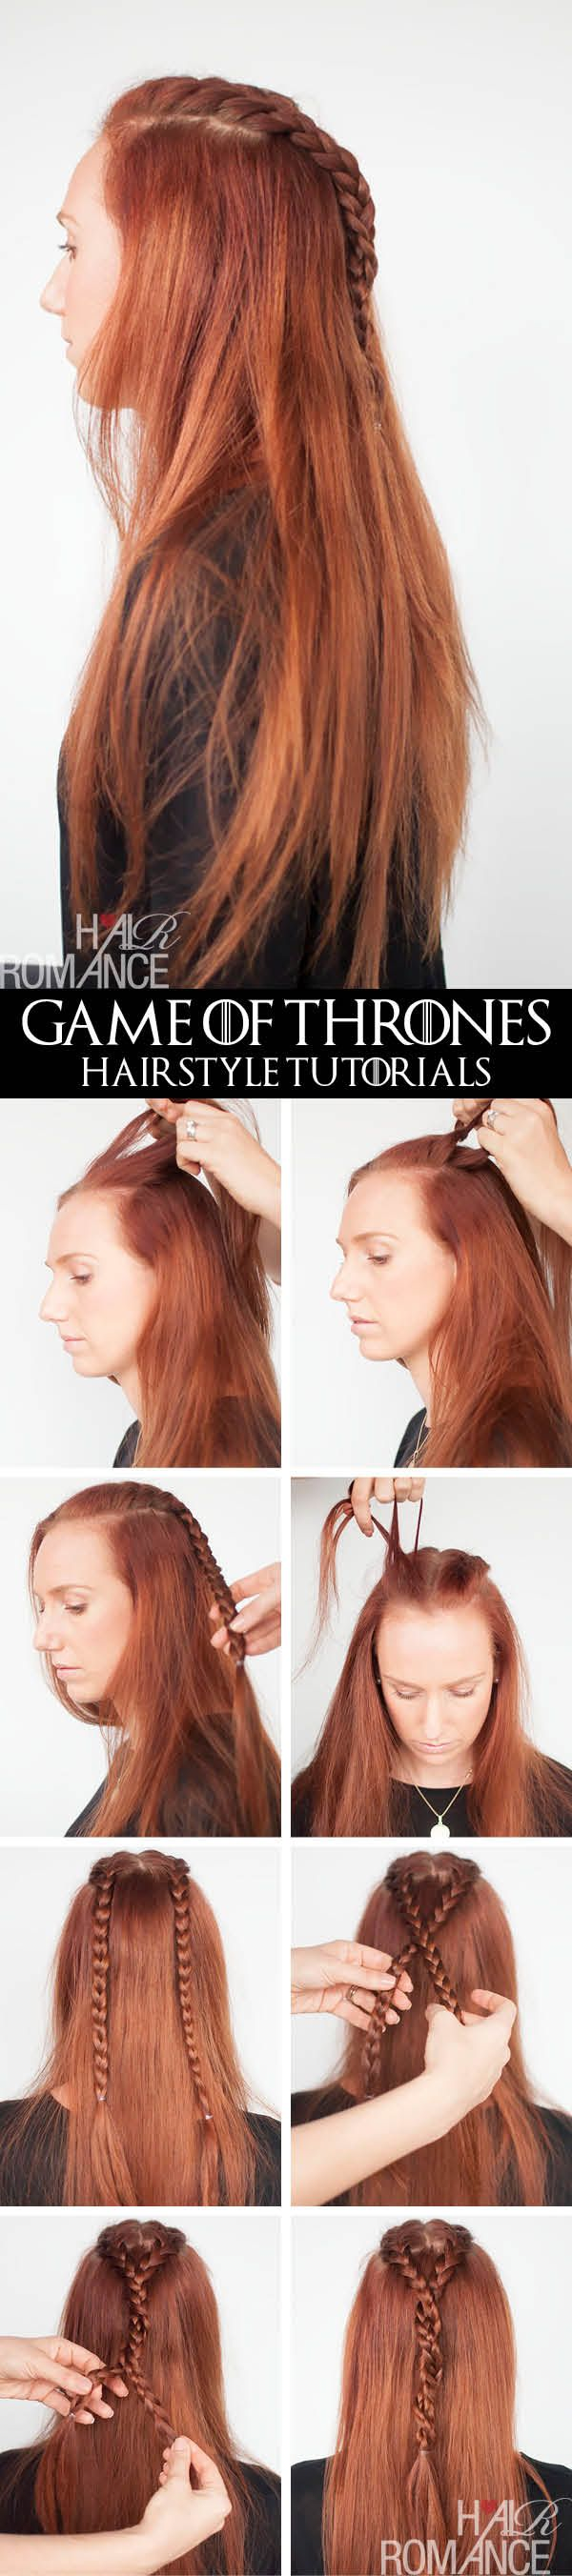 Hair Romance - Game of Thrones - hairstyle tutorials - Sansa Stark braids